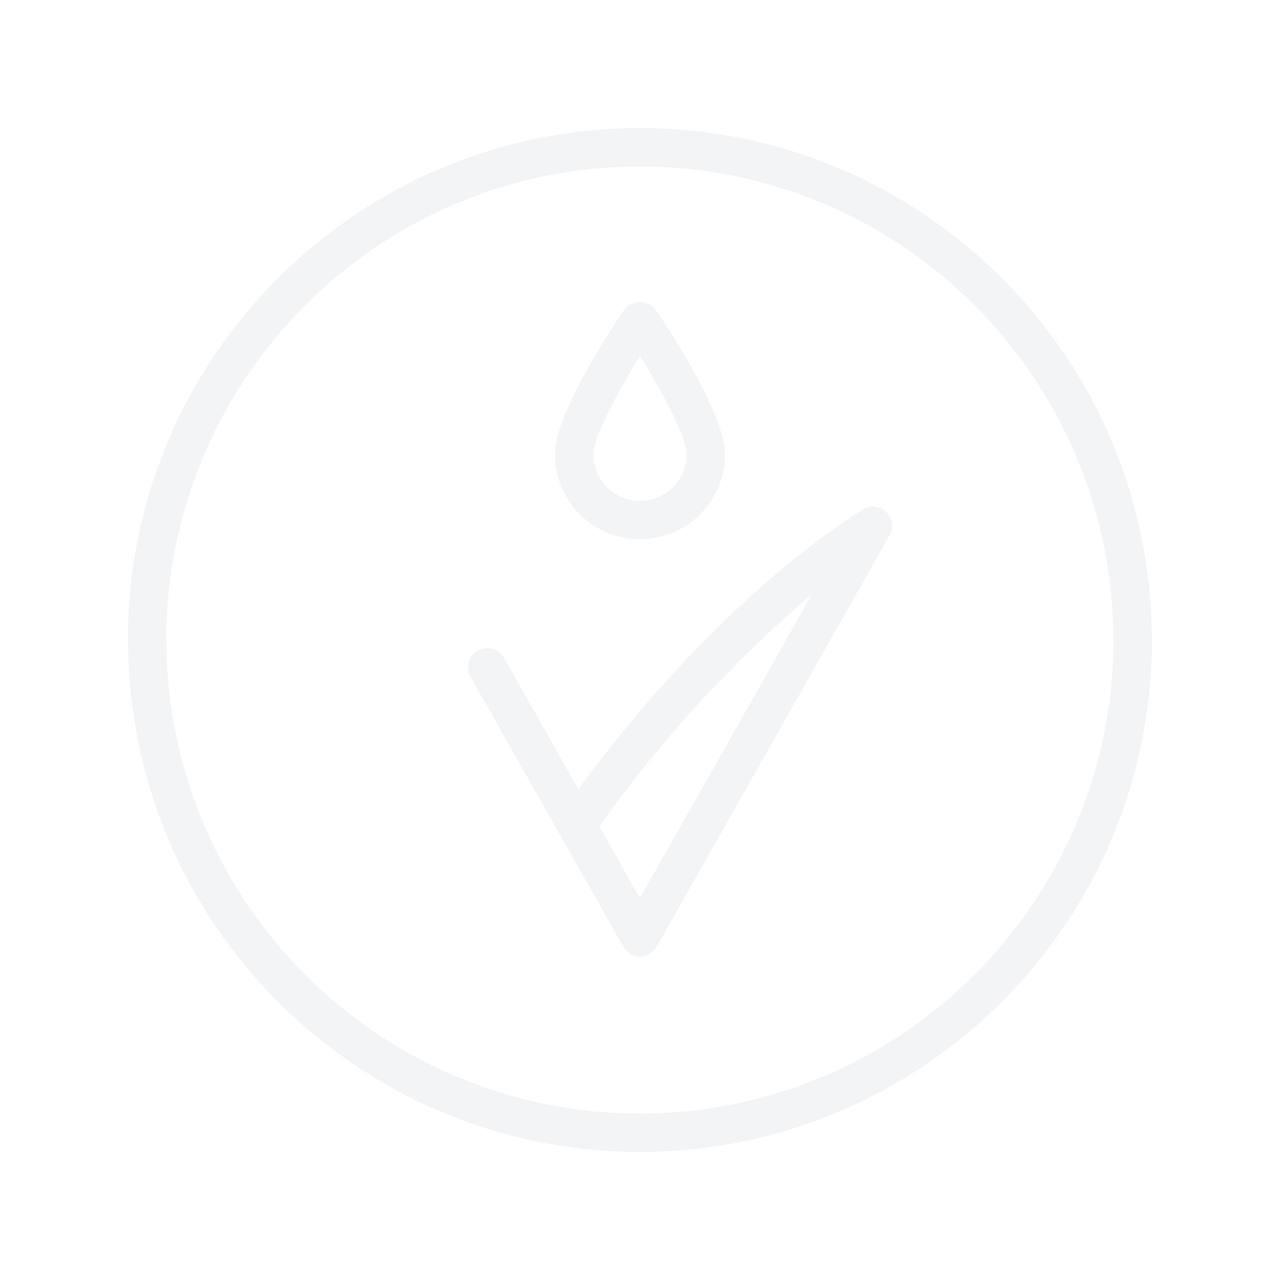 Hugo Boss Hugo Man Deodorant Stick 75ml